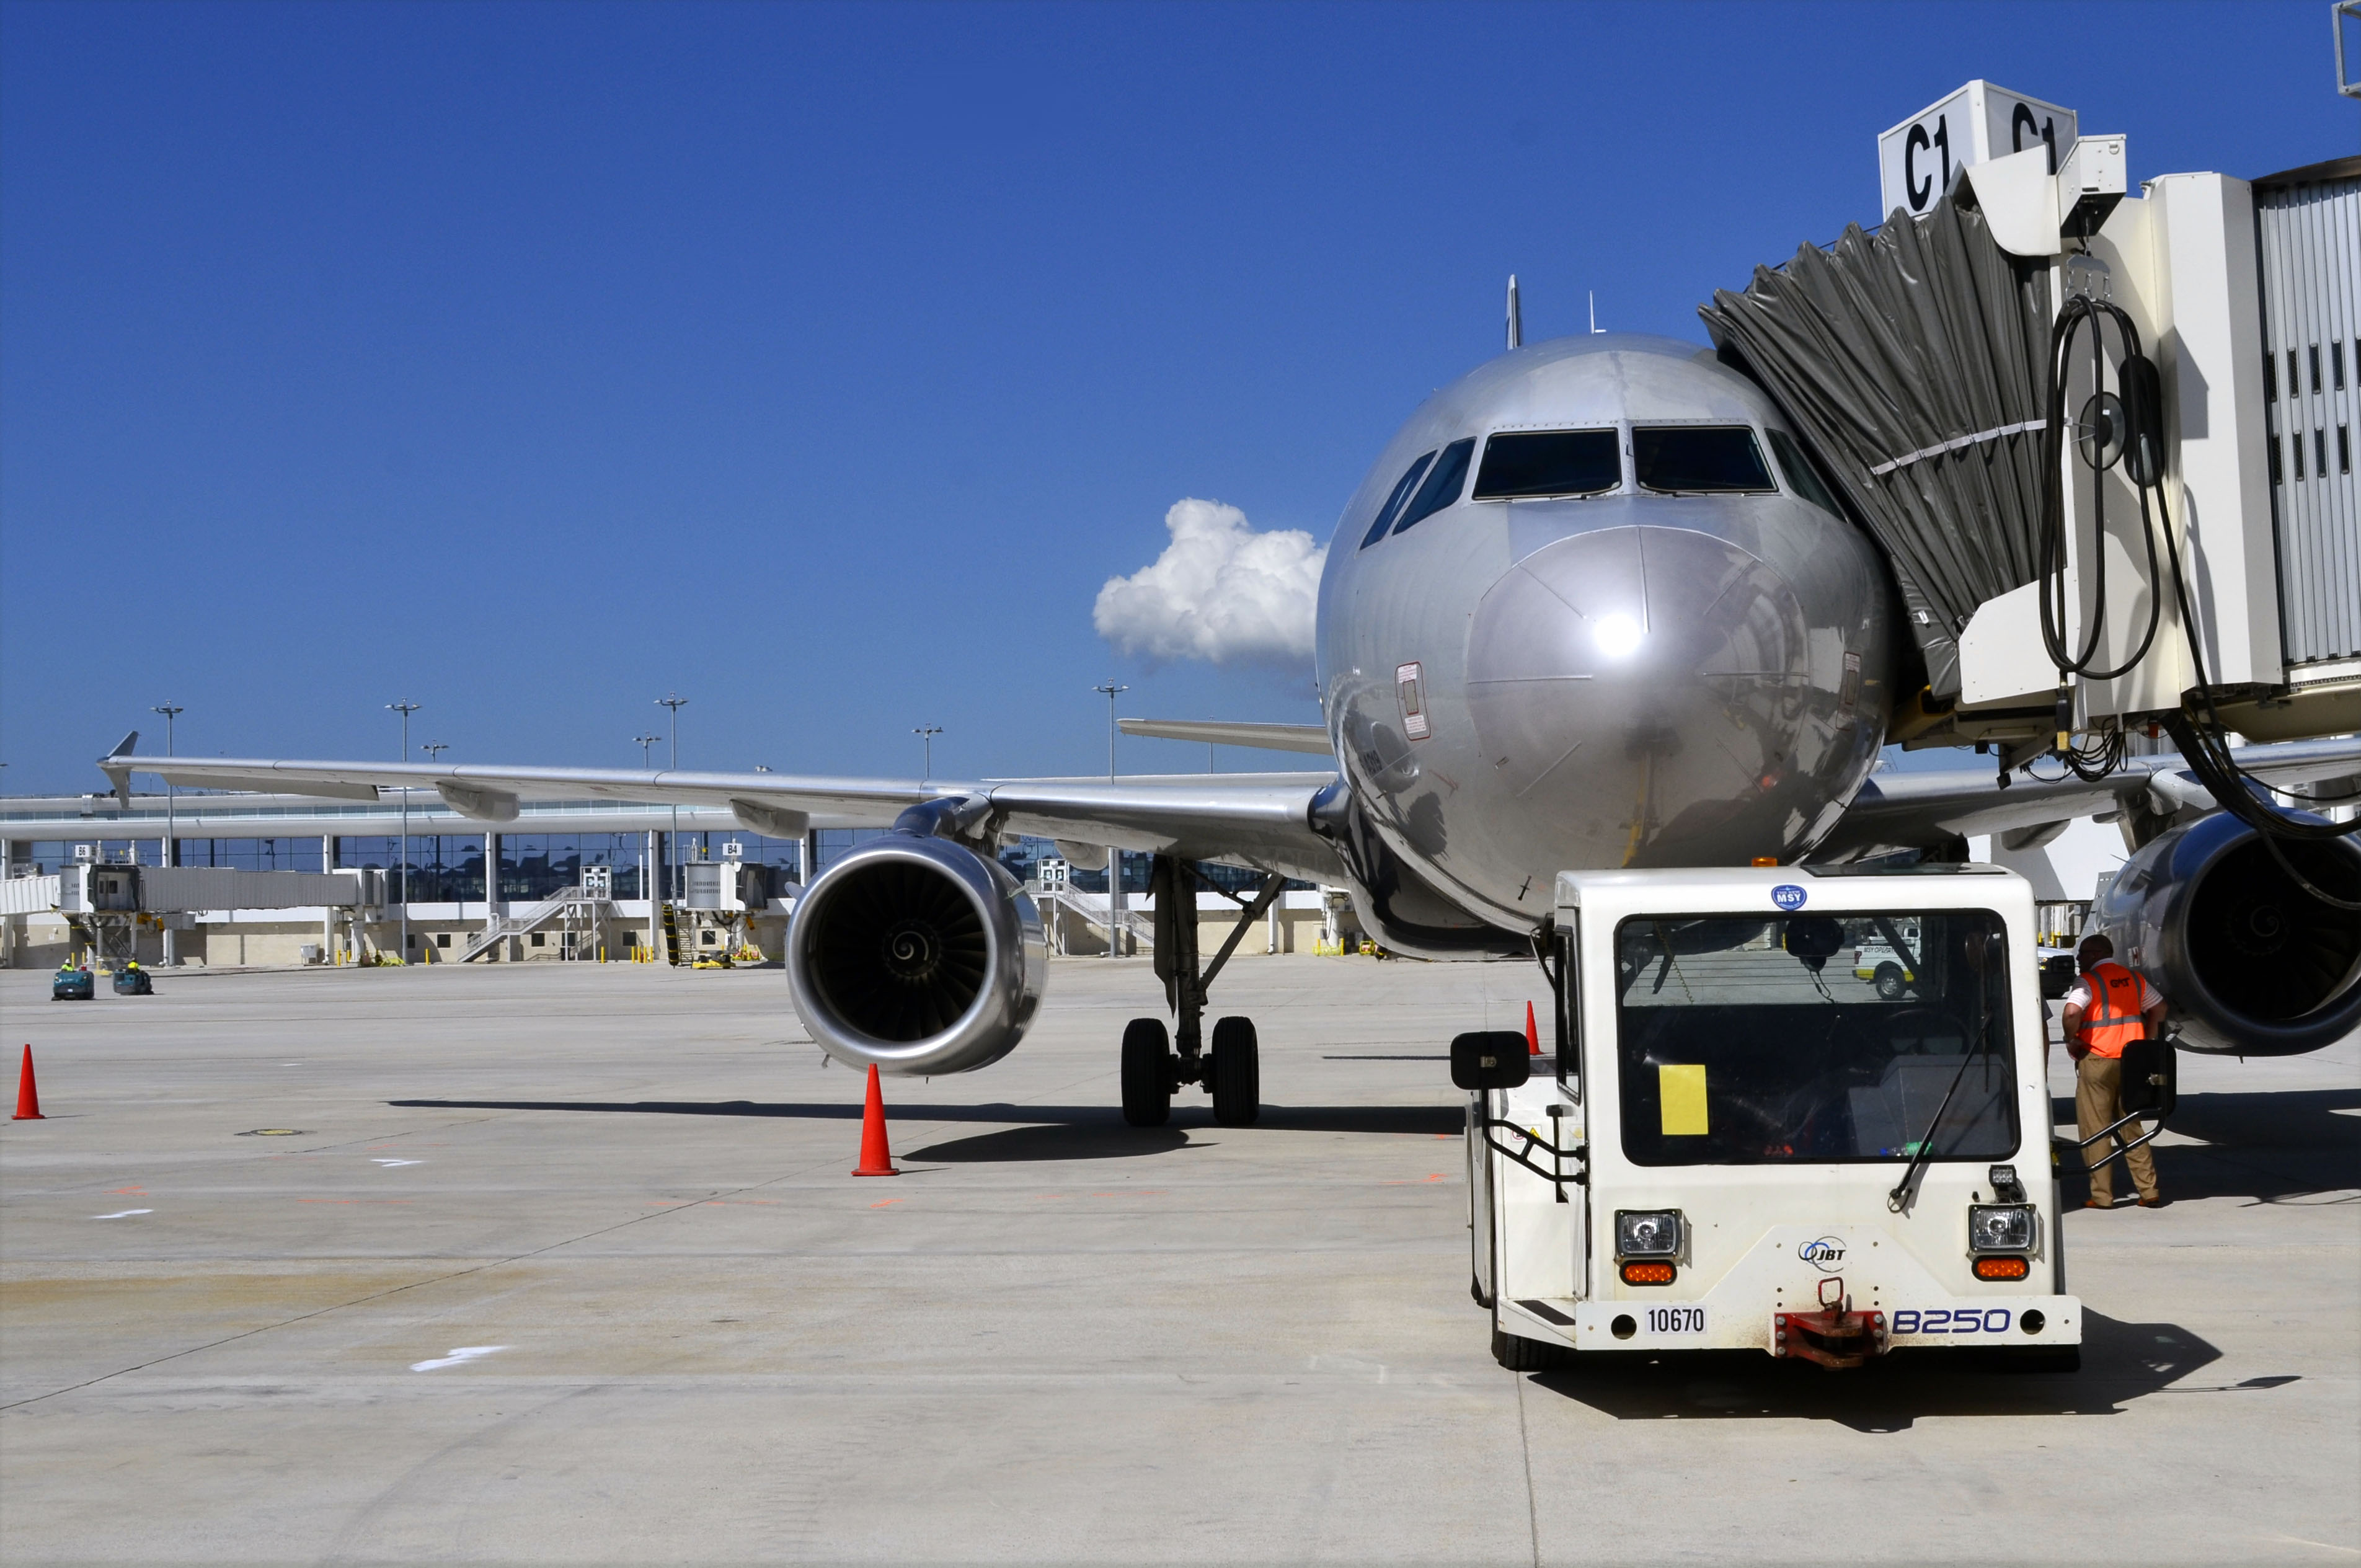 Airplane on ramp